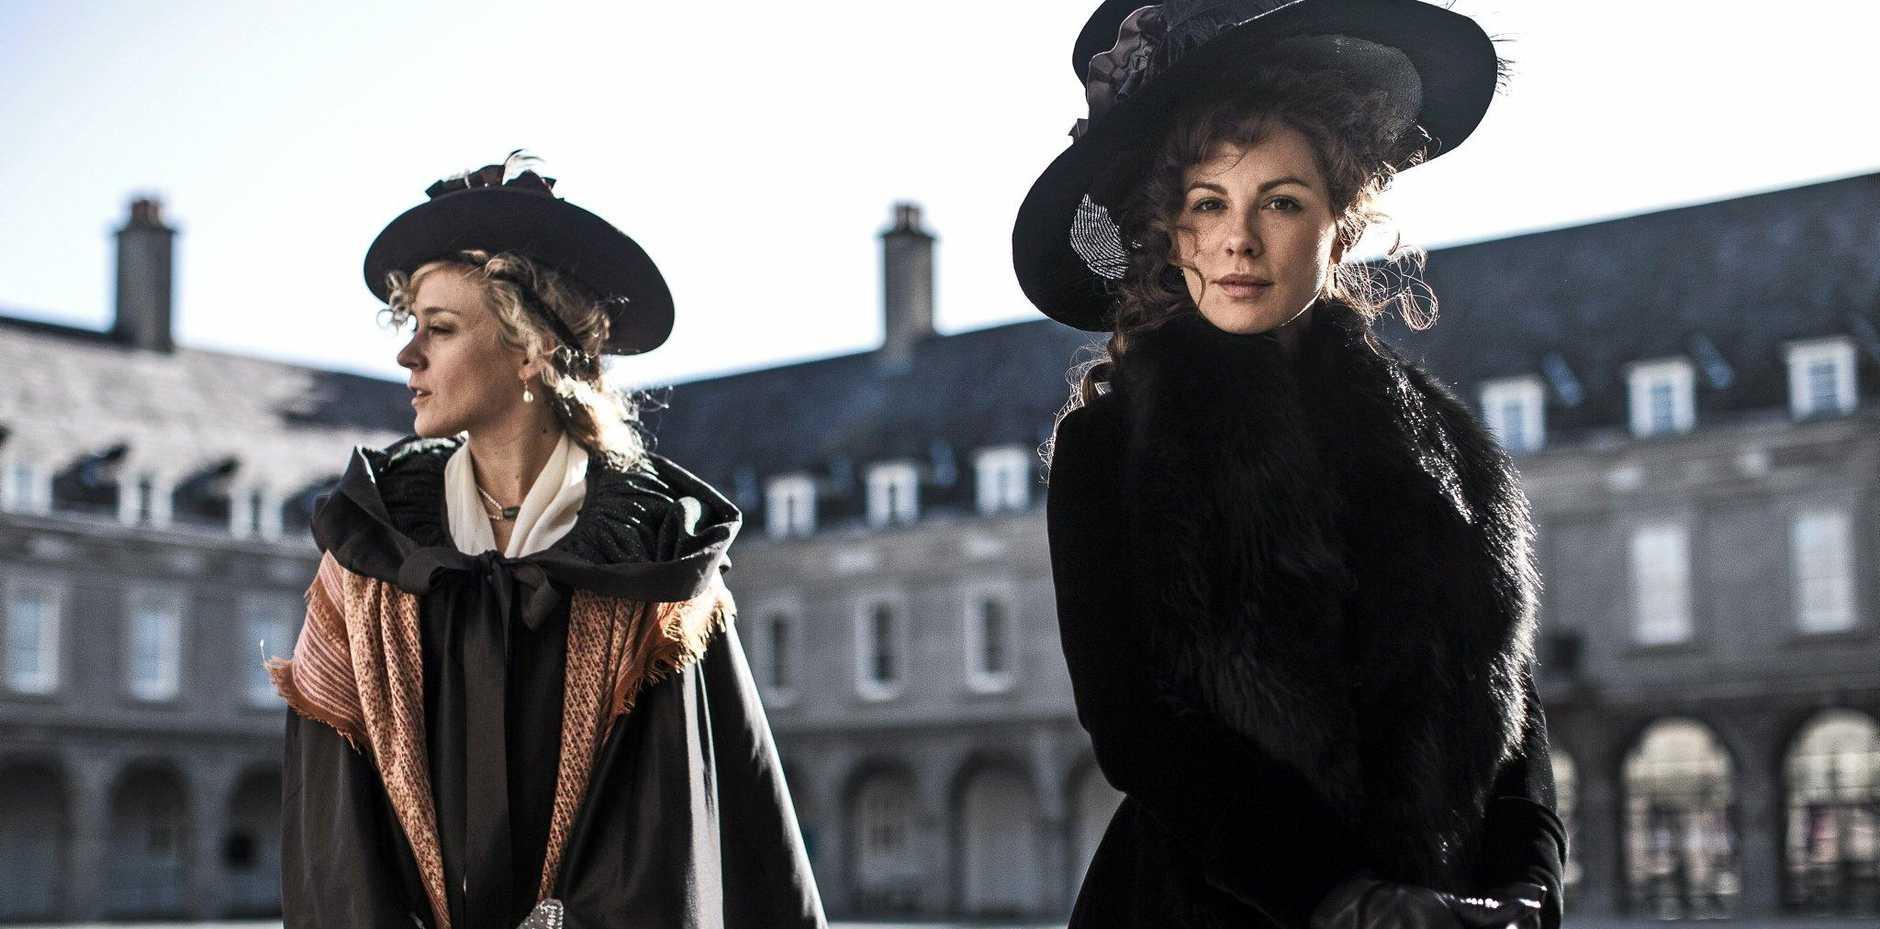 Kate Beckinsale and Chloe Sevigny star in the movie Love & Friendship.